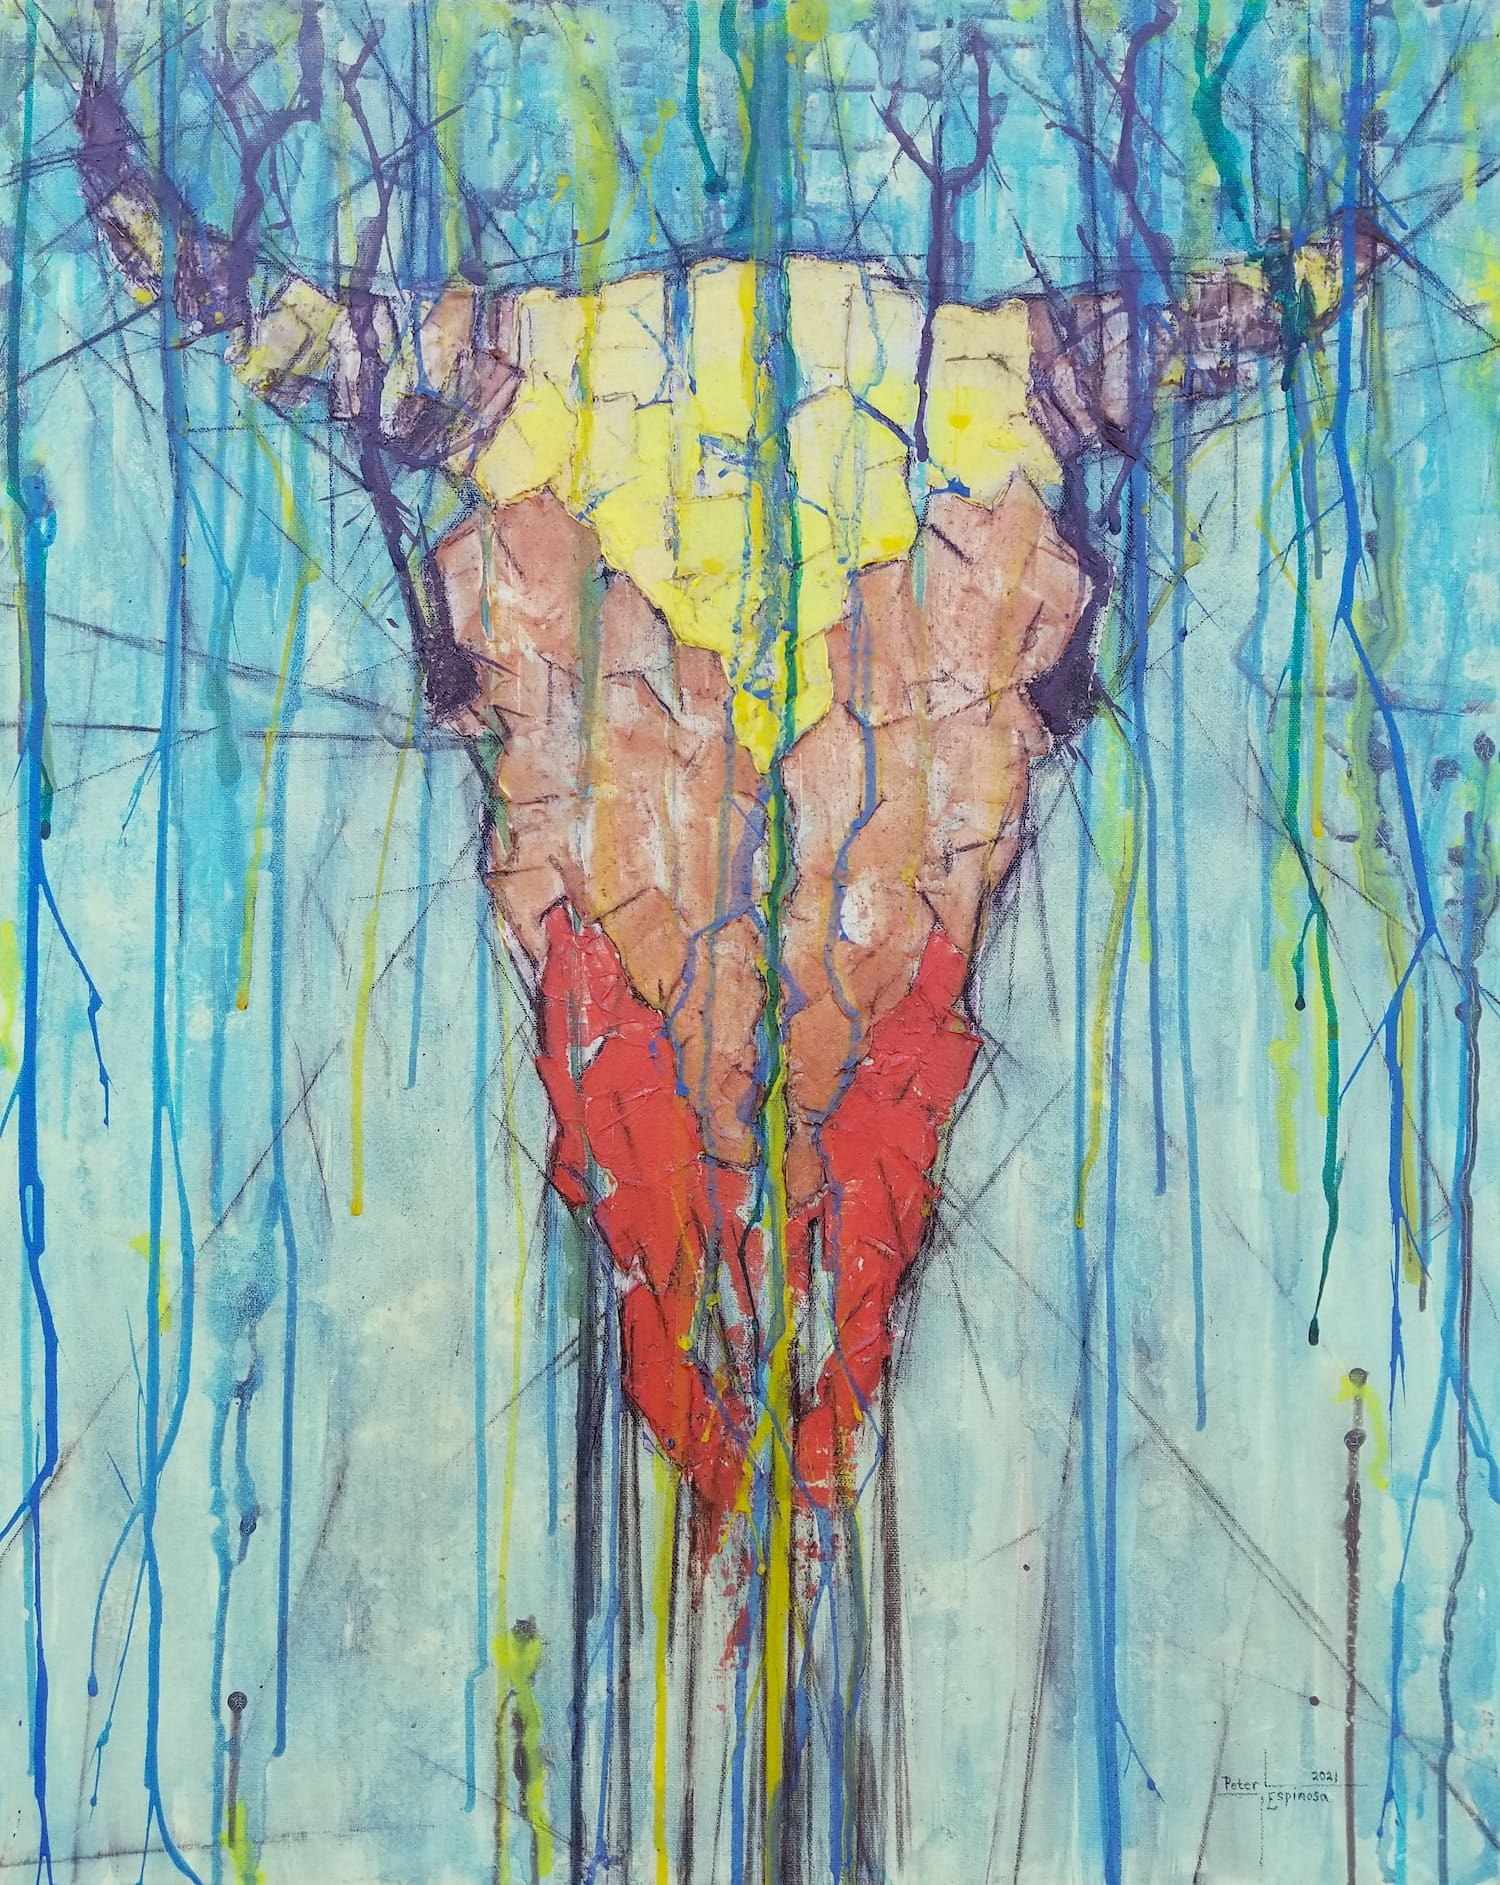 espinosa-art-cowskull-painting-ink-drips